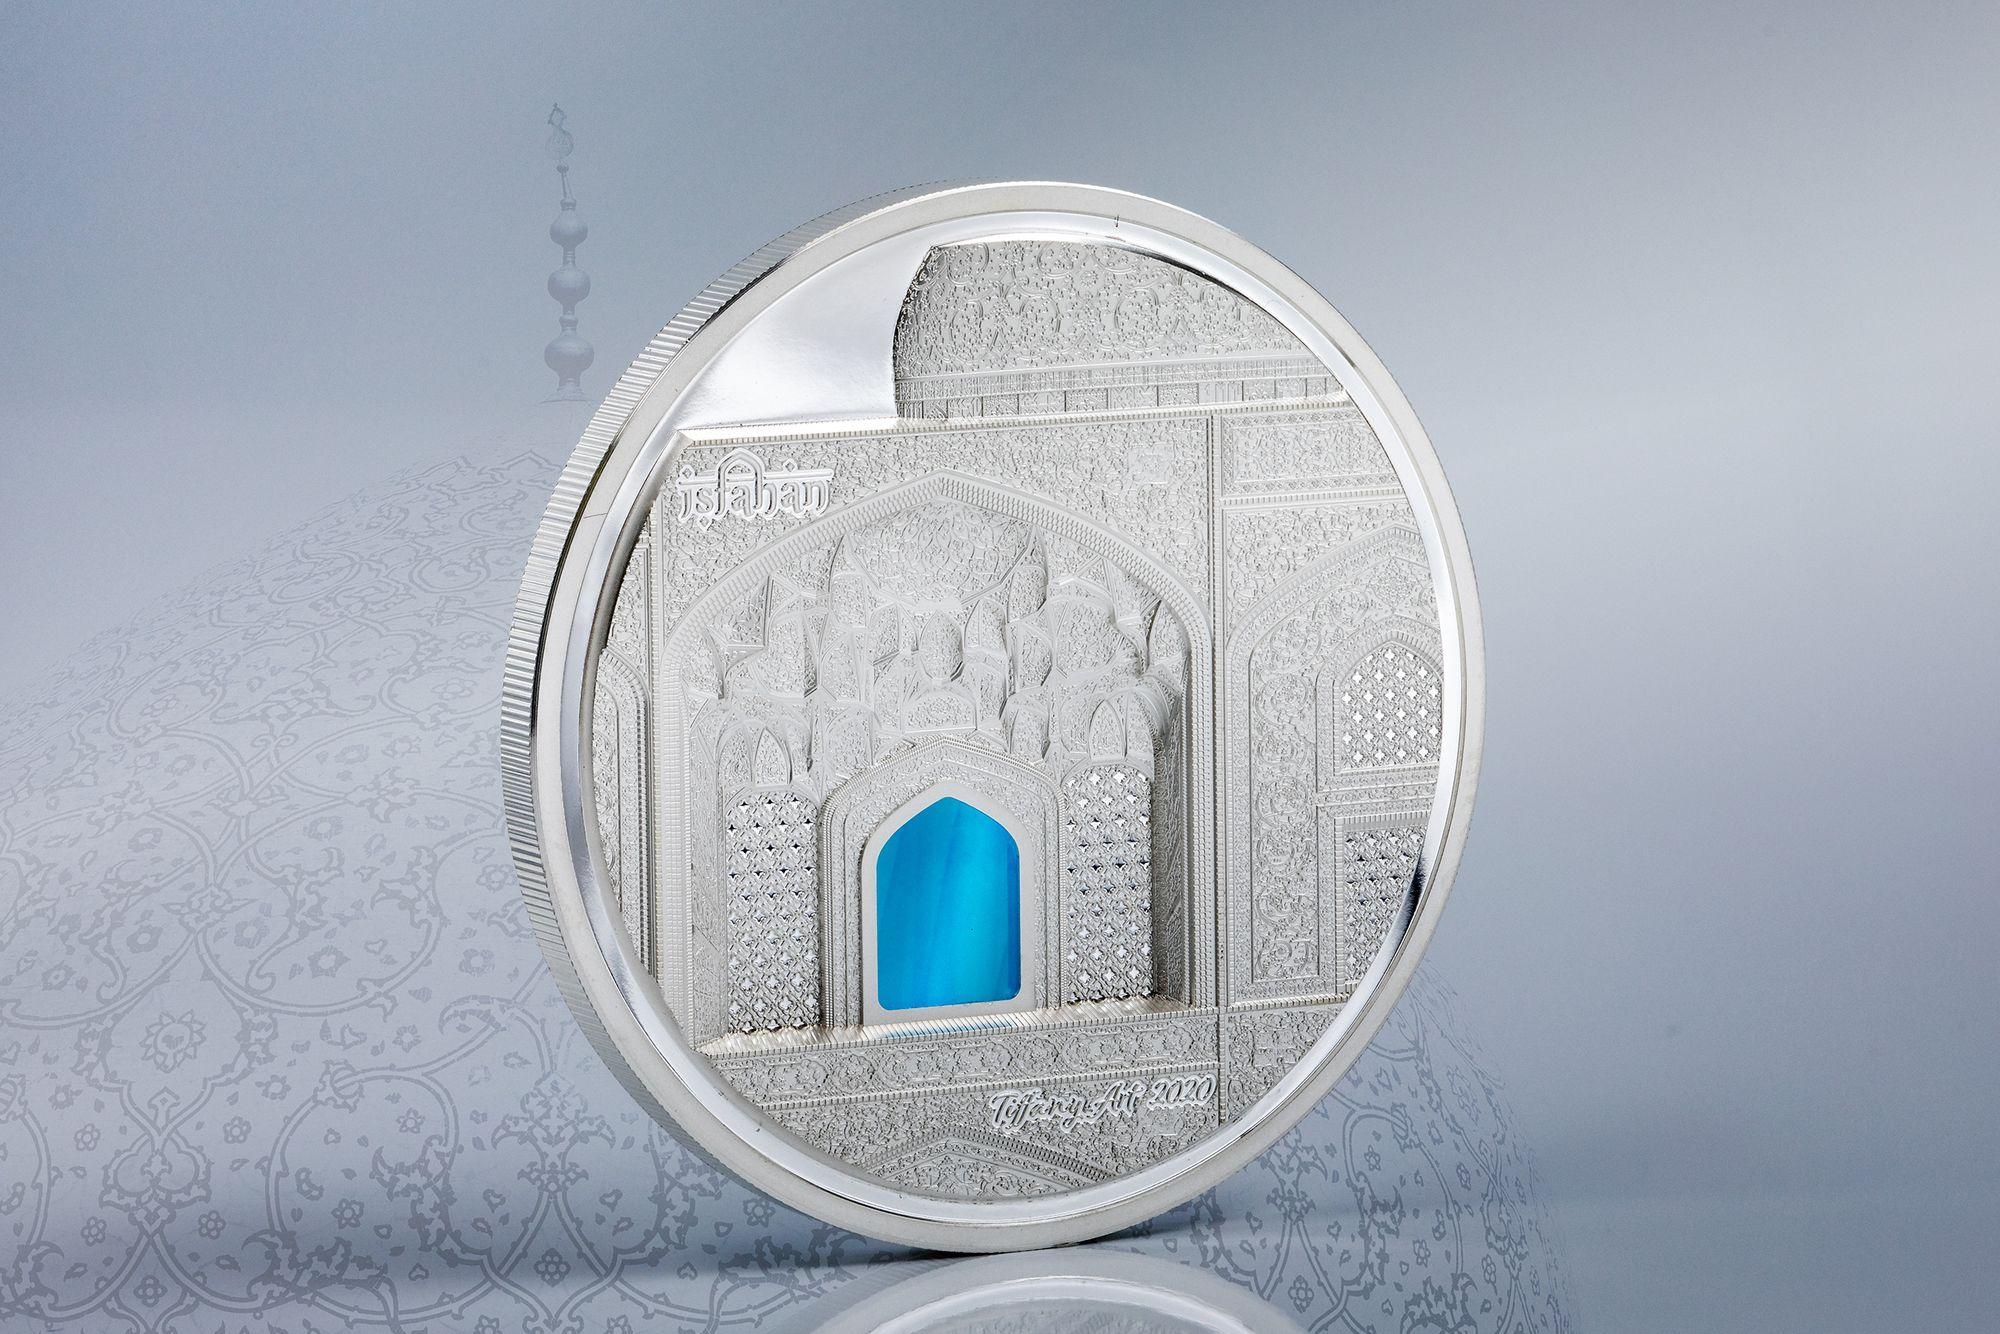 2020 Tiffany Art Isfahan 3oz Silver Proof Coin